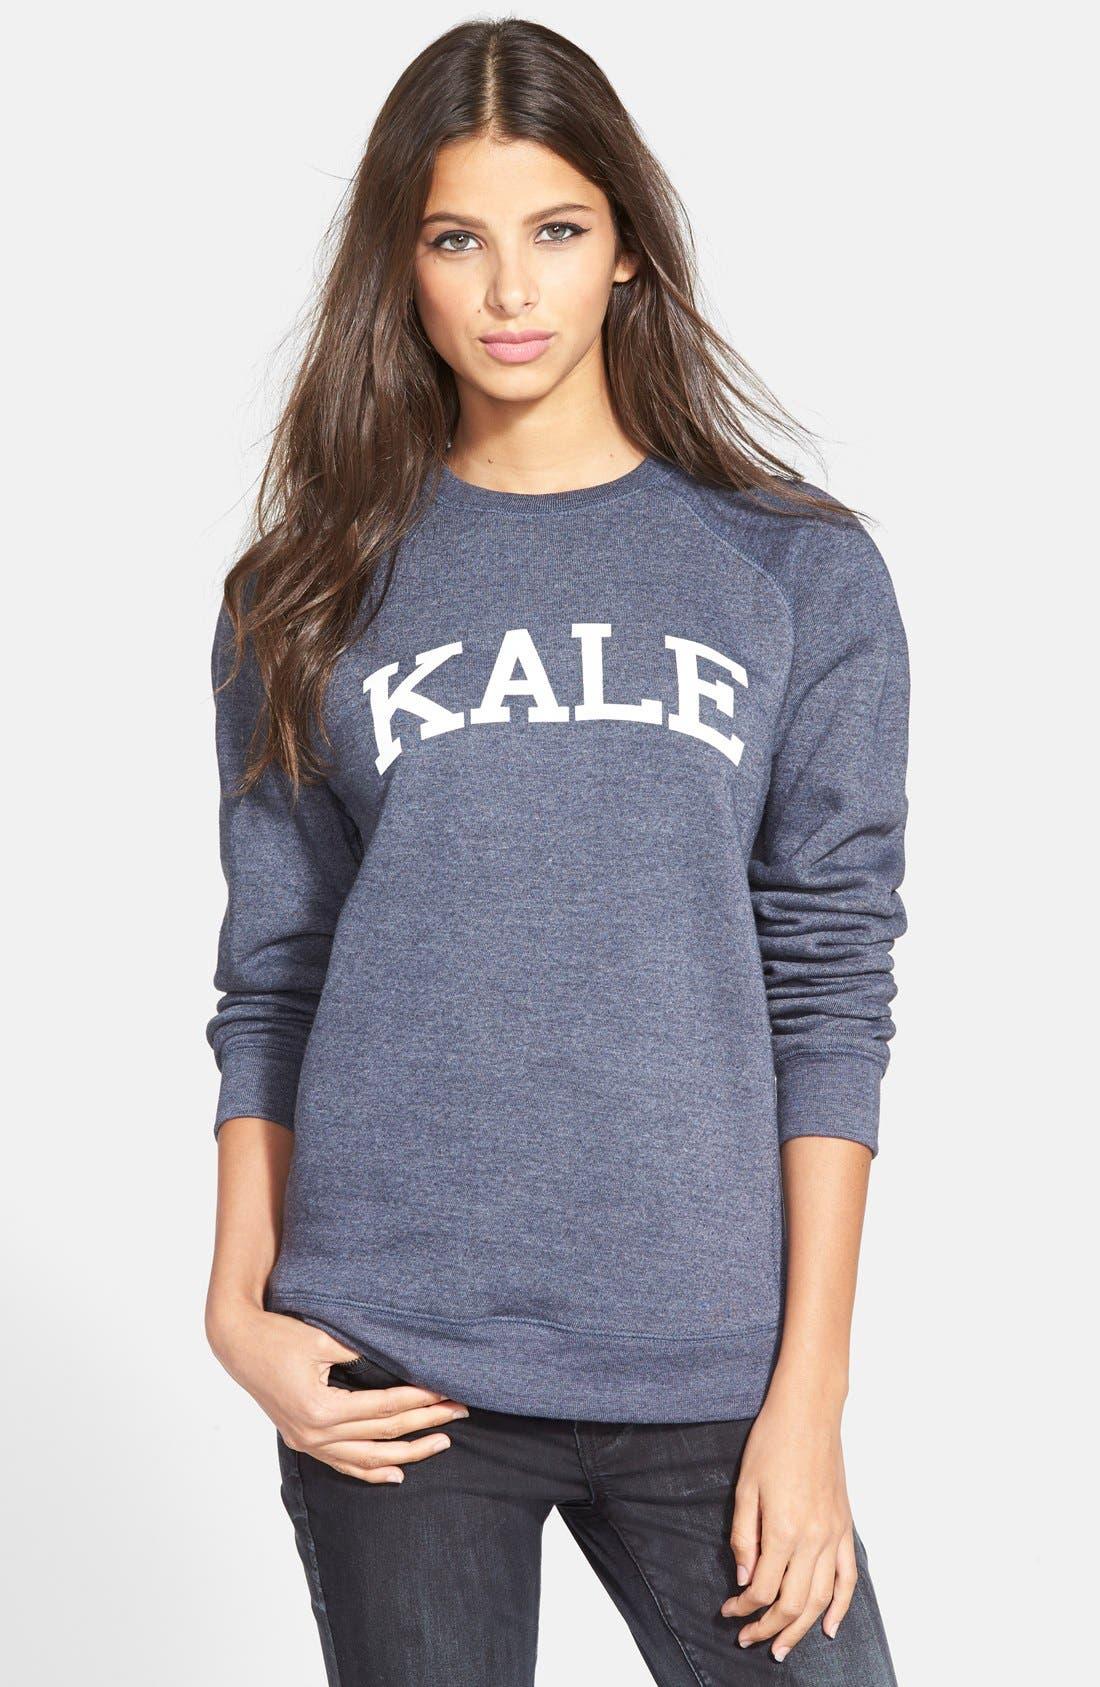 'Kale' Raglan Sweatshirt,                             Main thumbnail 1, color,                             410